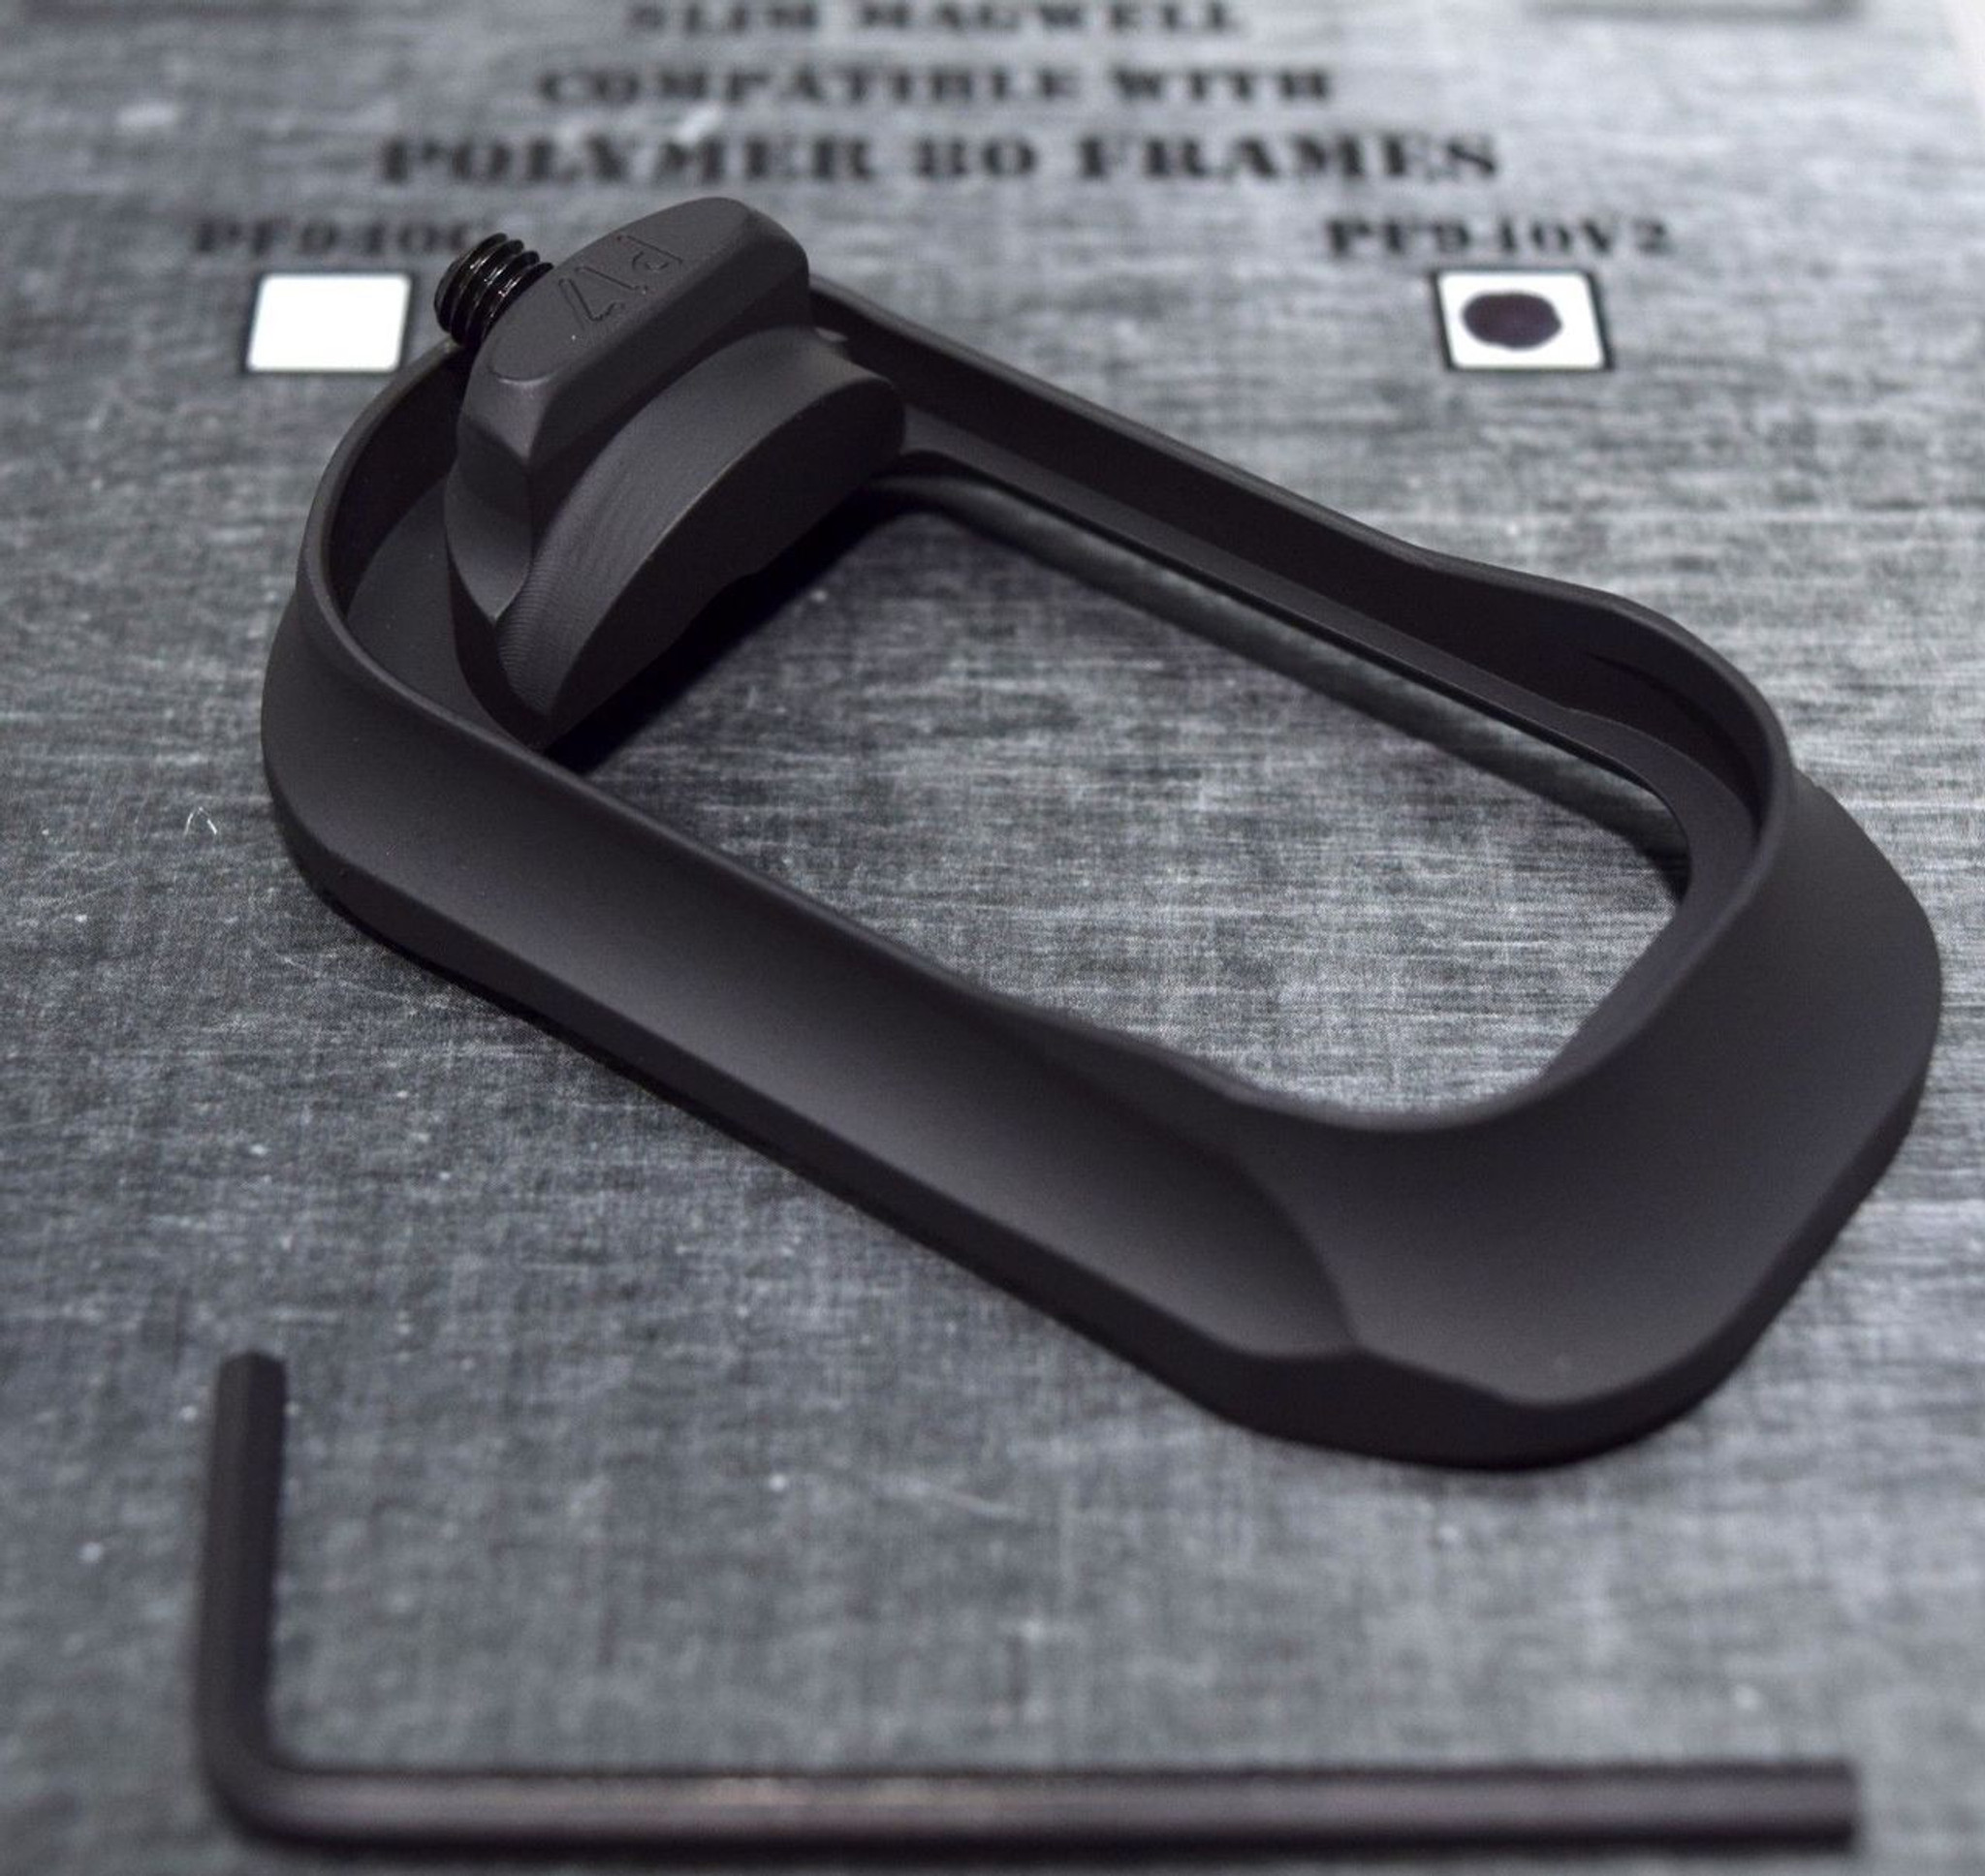 Steel City Arsenal Slim magwell for Polymer 80 PF940V2 Frames- Ano Black